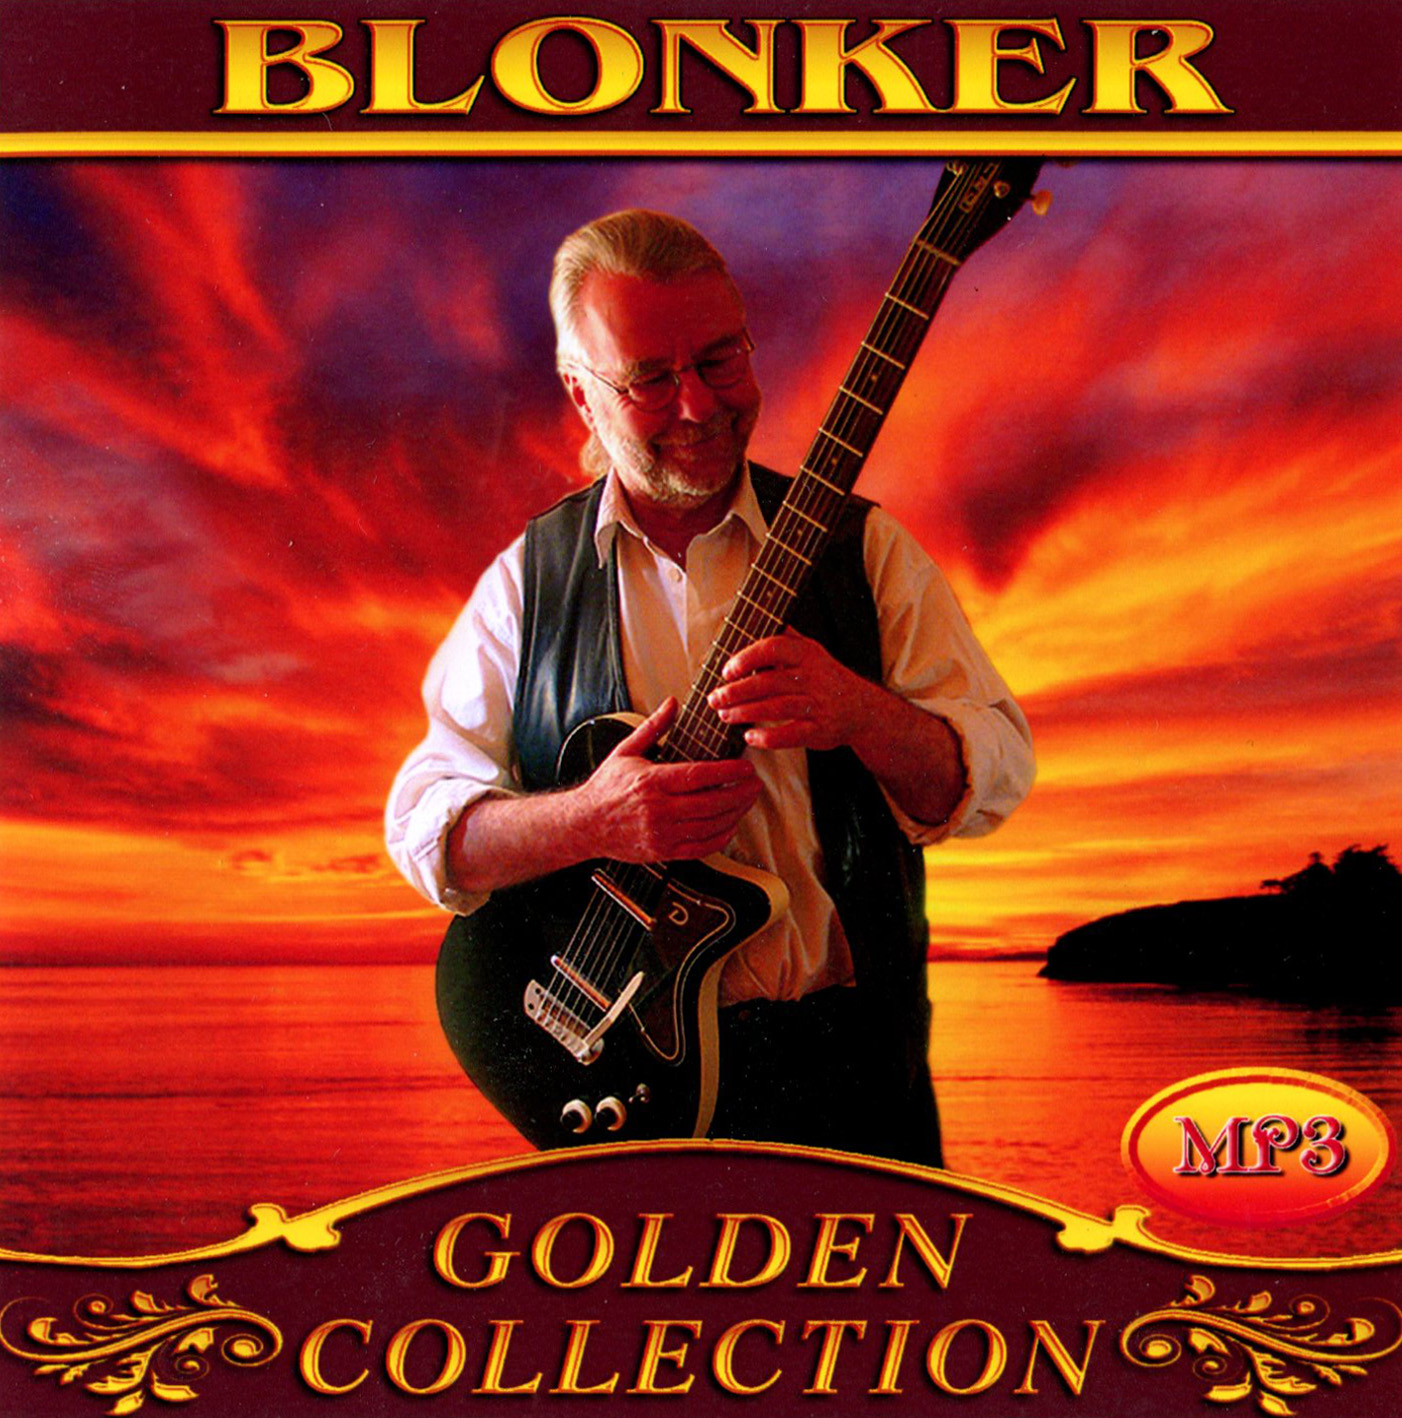 Blonker [mp3]